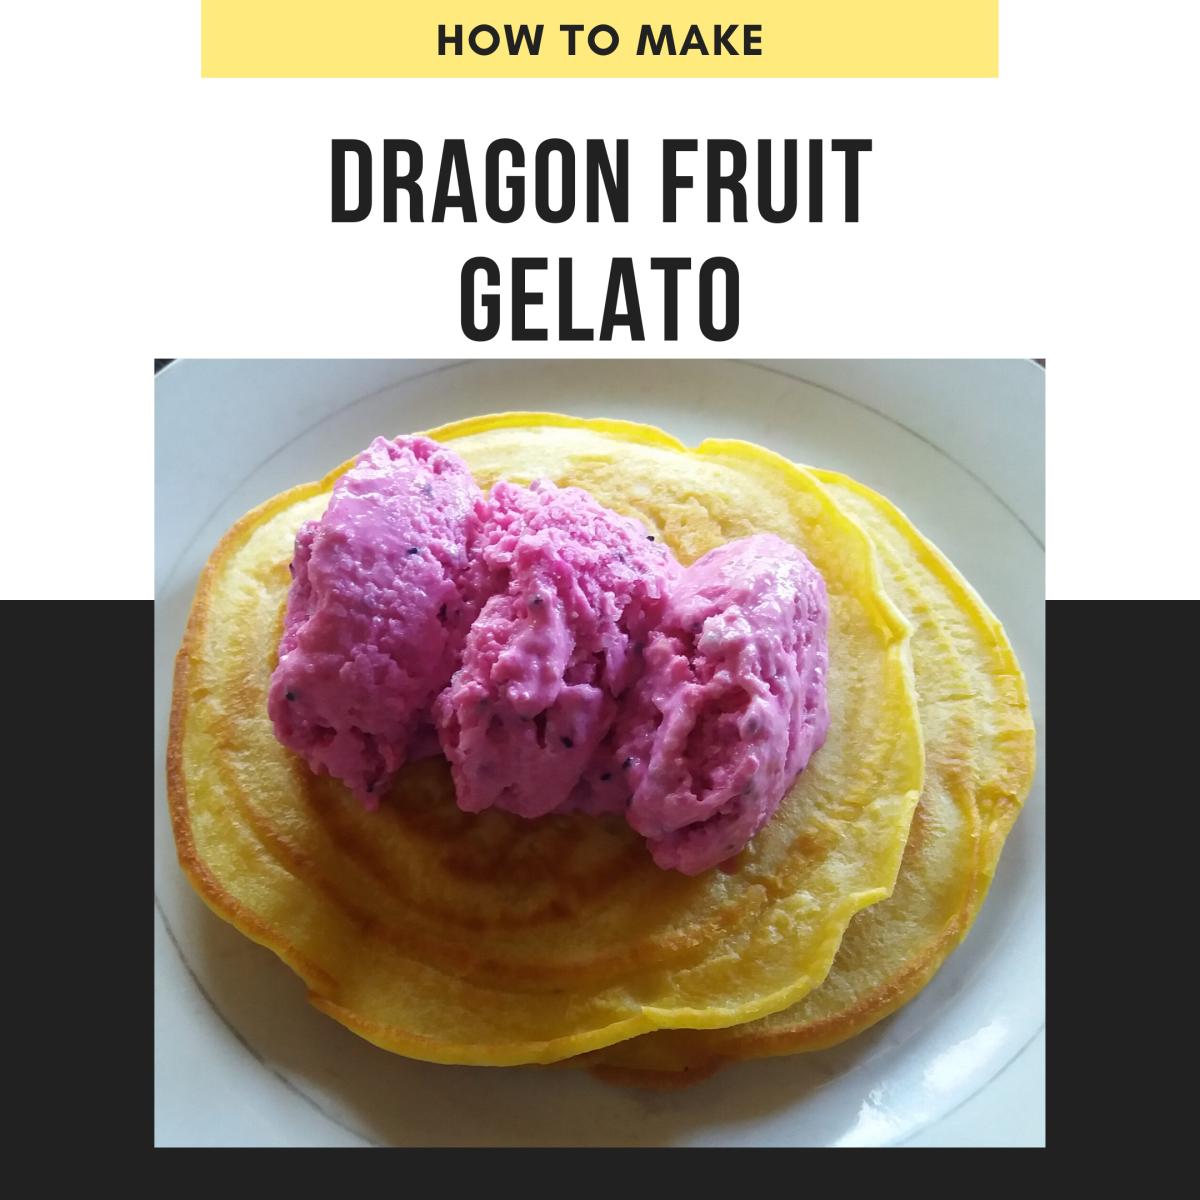 Dragon fruit gelato